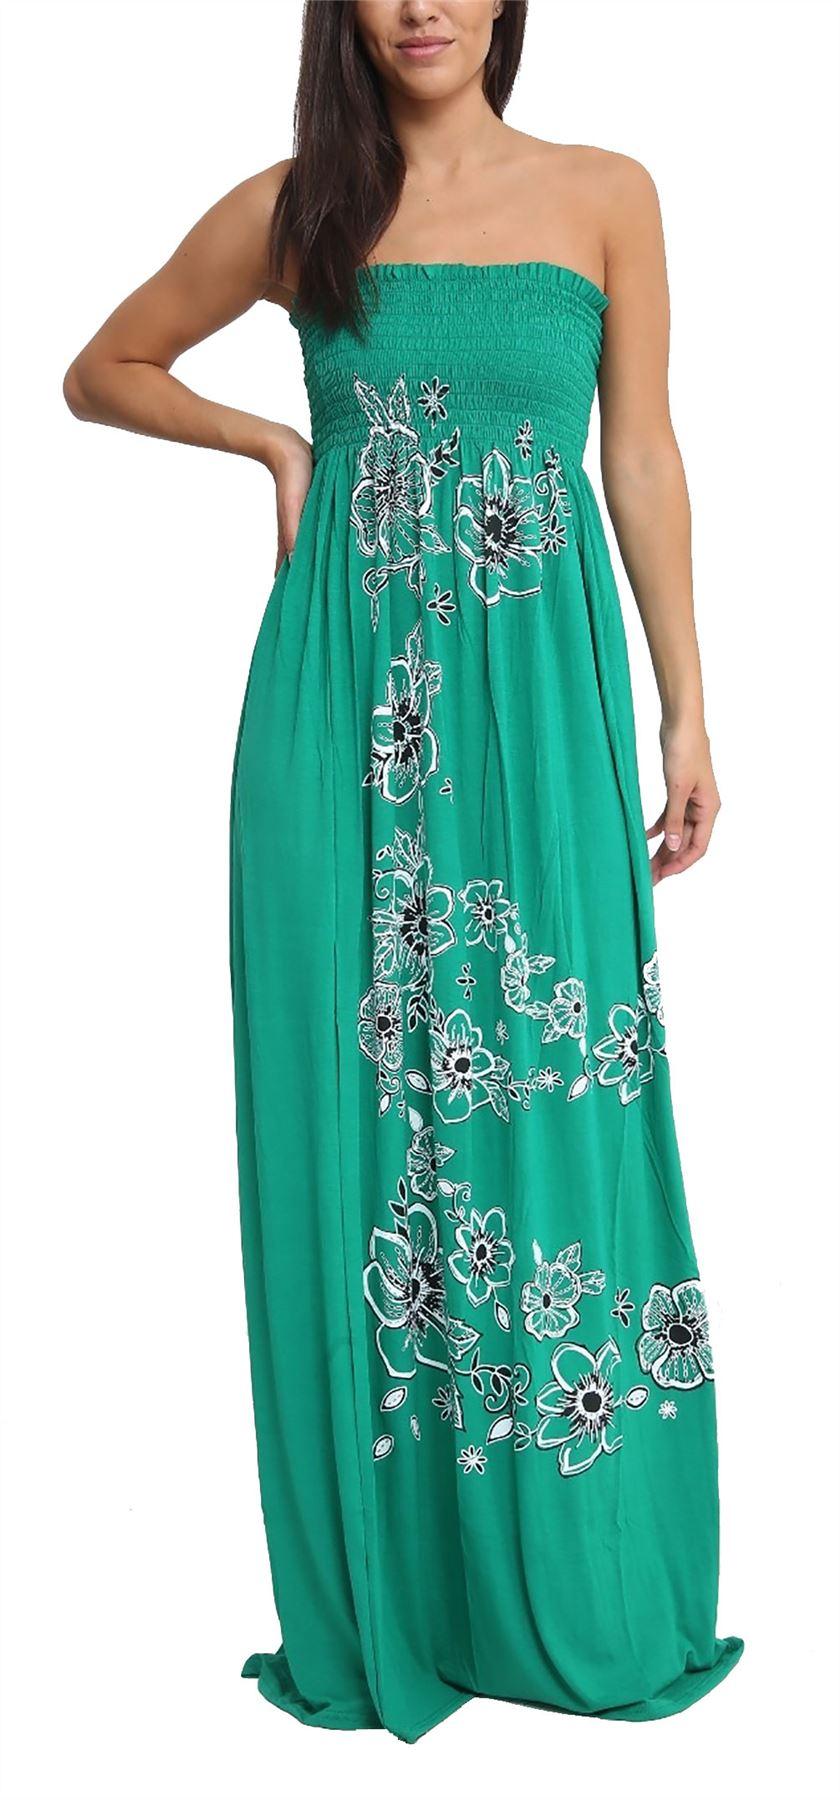 Womens Chunky Flower Printed Sheering Maxi Dress Ladies Sleeveless ...